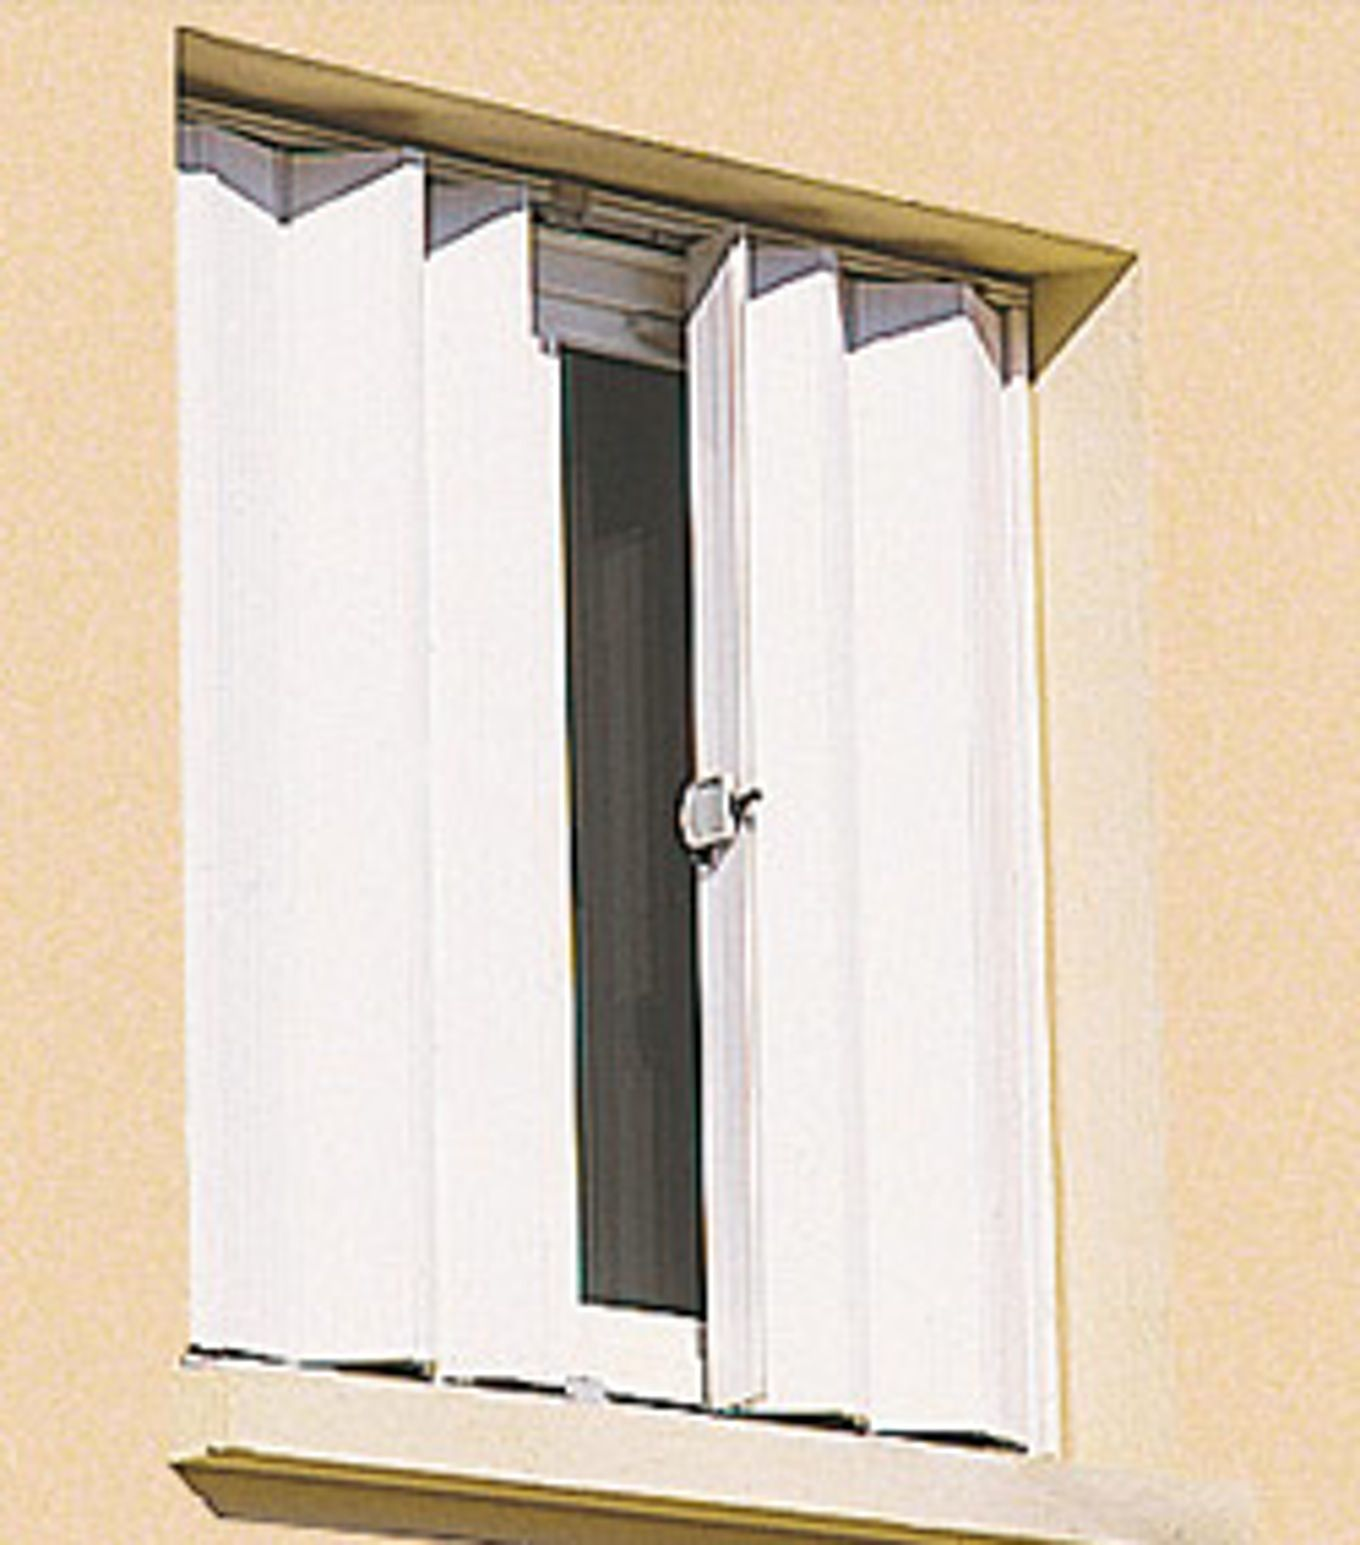 Porte coulissante persienne coulissante porte placard for Porte suspendue castorama